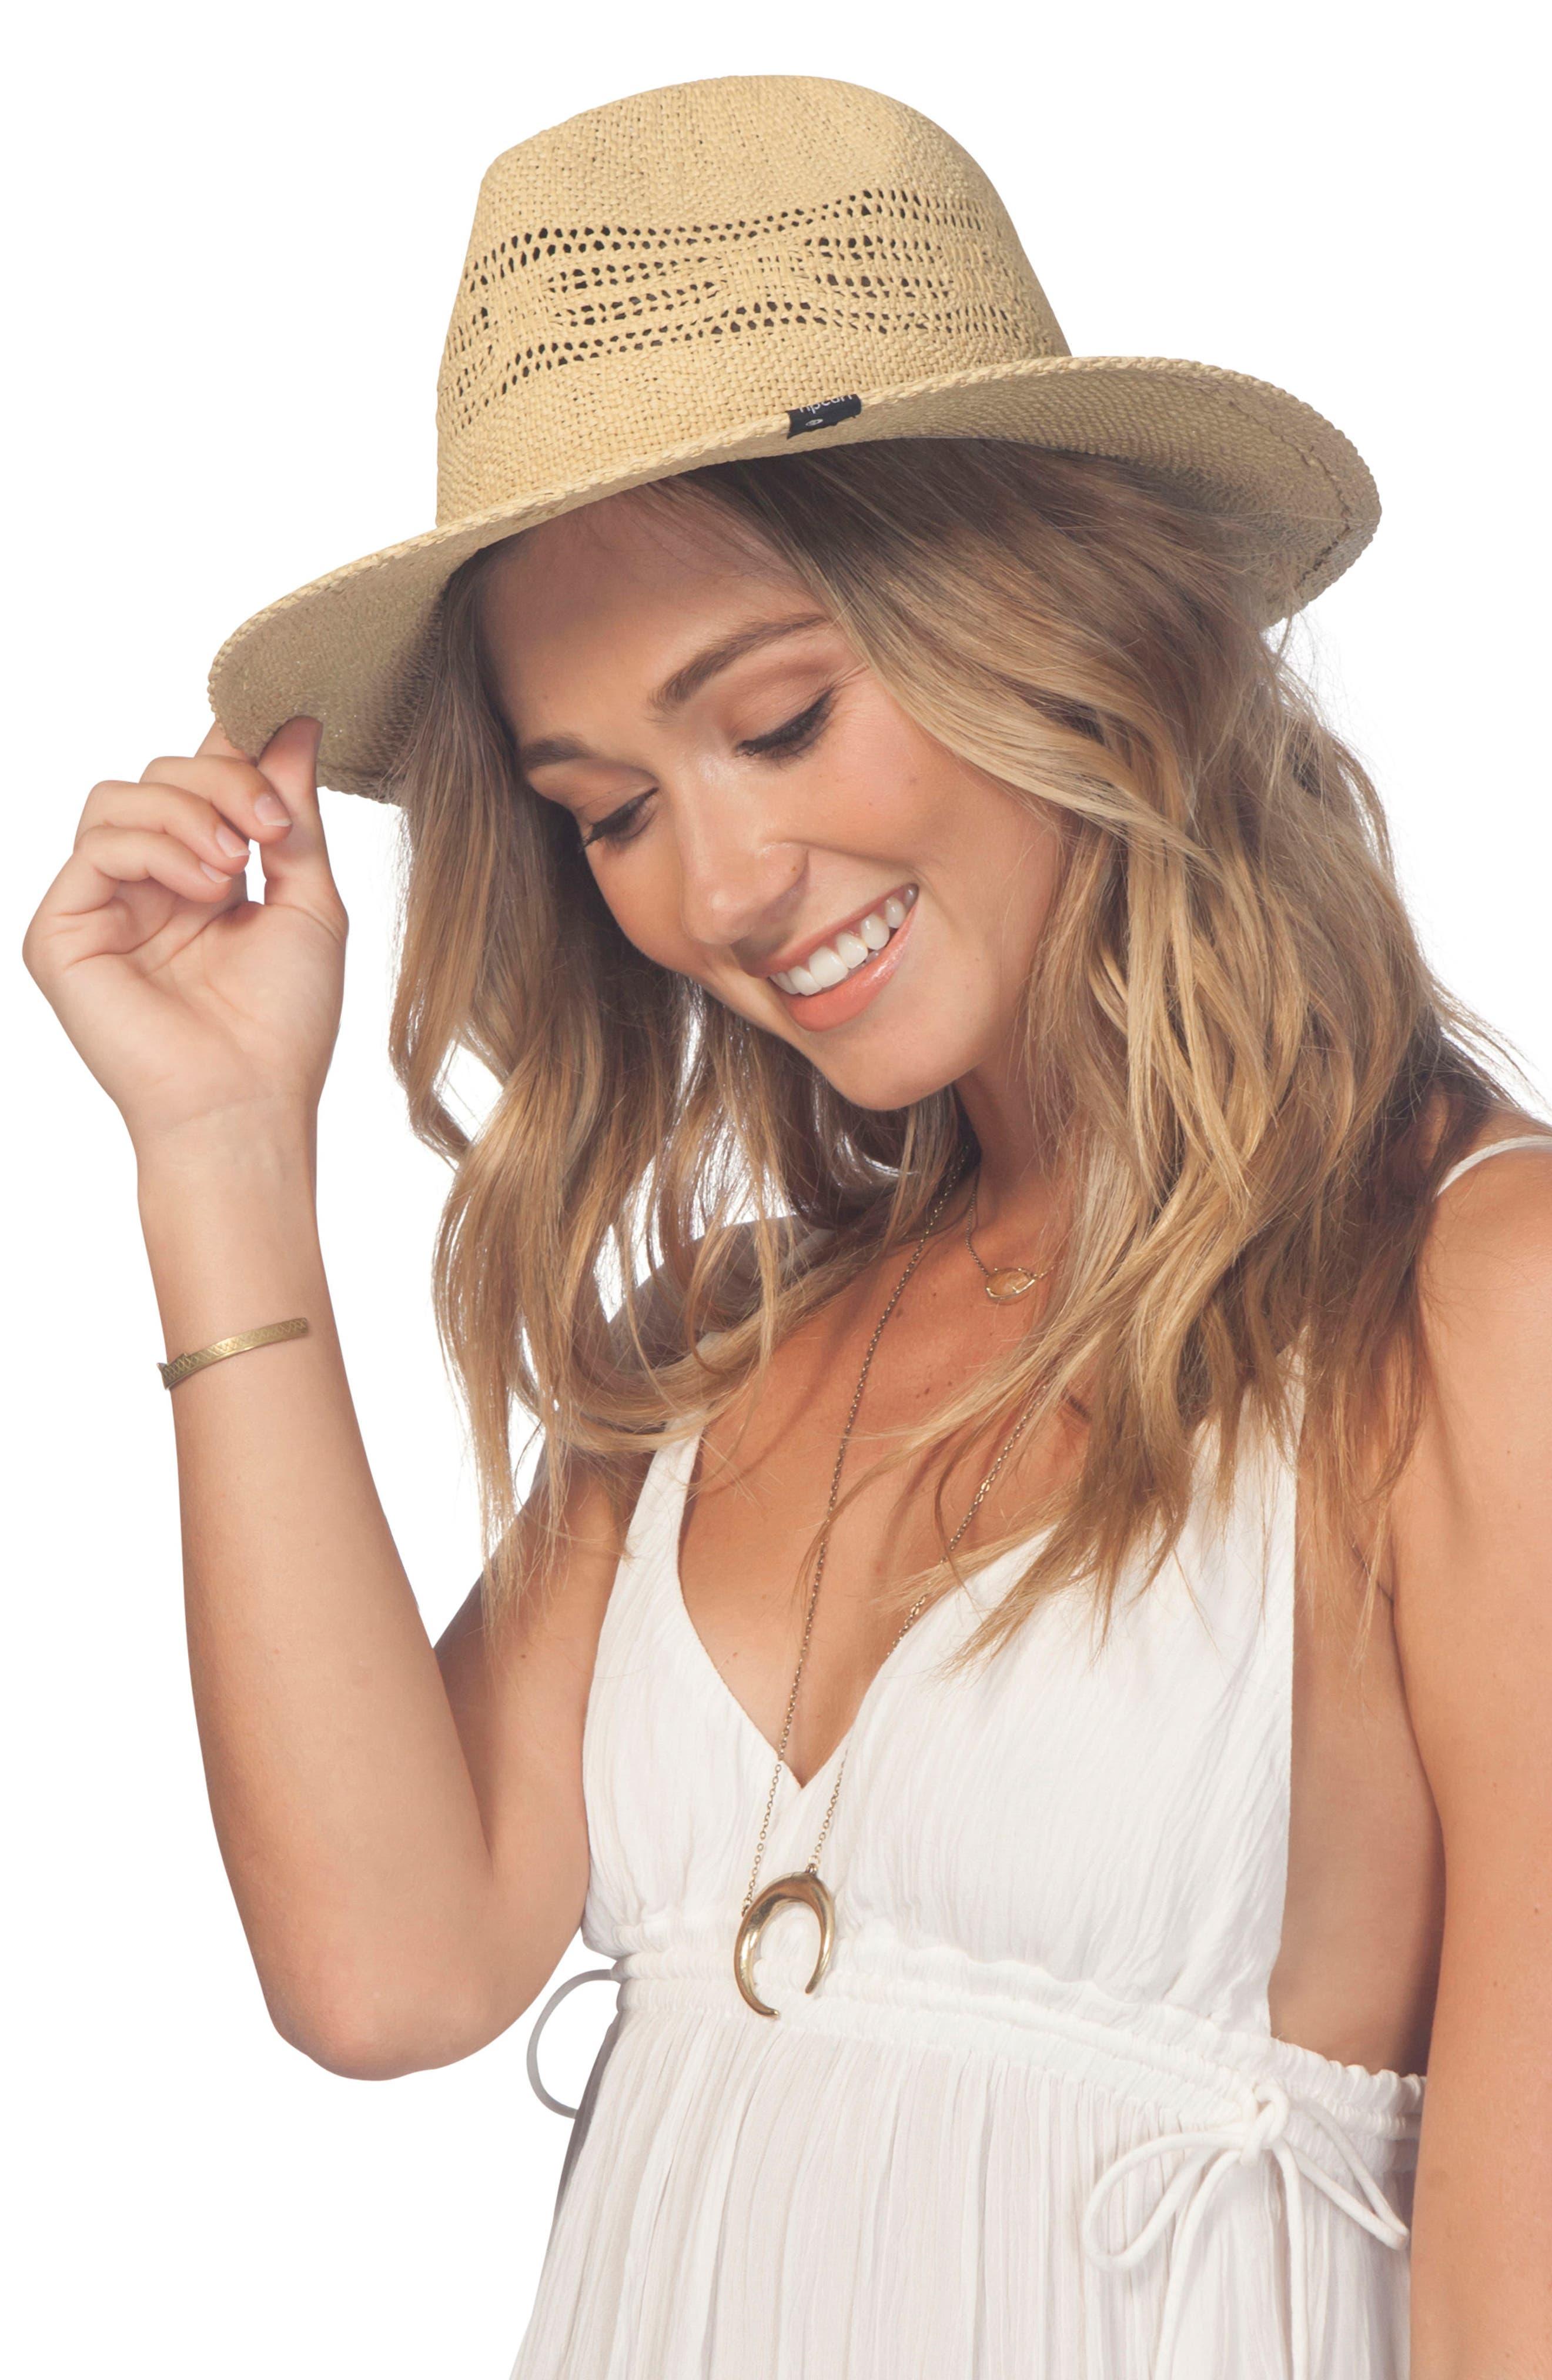 Ritual Panama Straw Hat,                             Alternate thumbnail 2, color,                             Natural